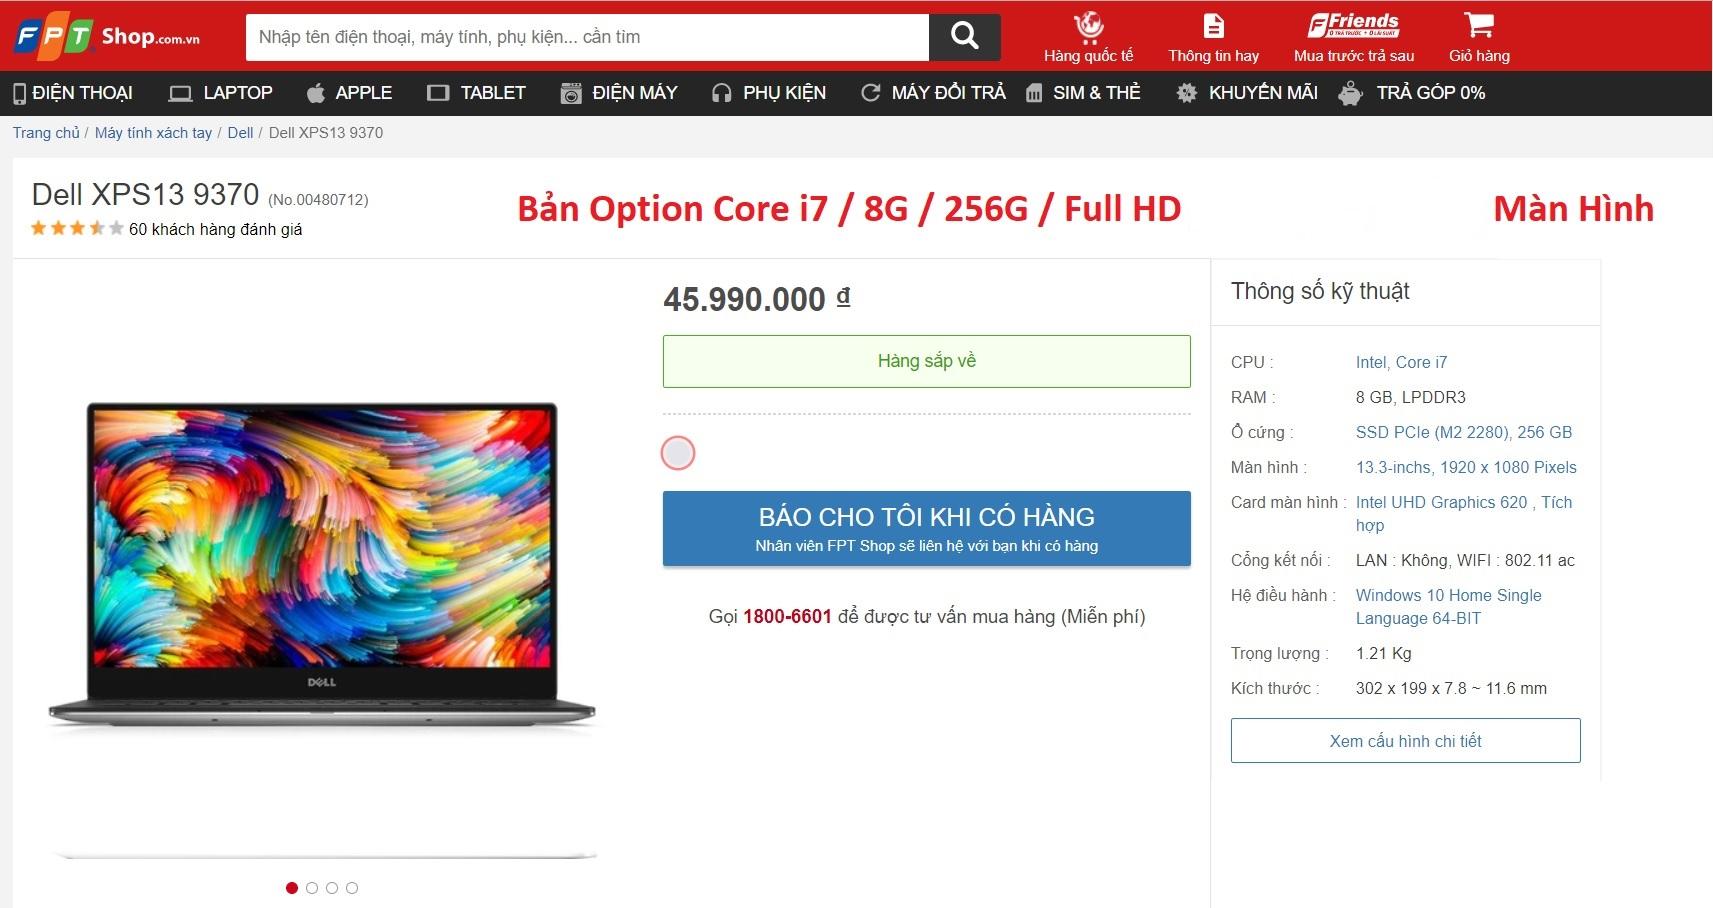 ==> bán 50 cái laptop Dell ... Core i3, i5, i7 ...máy đẹp, zin all. - 26